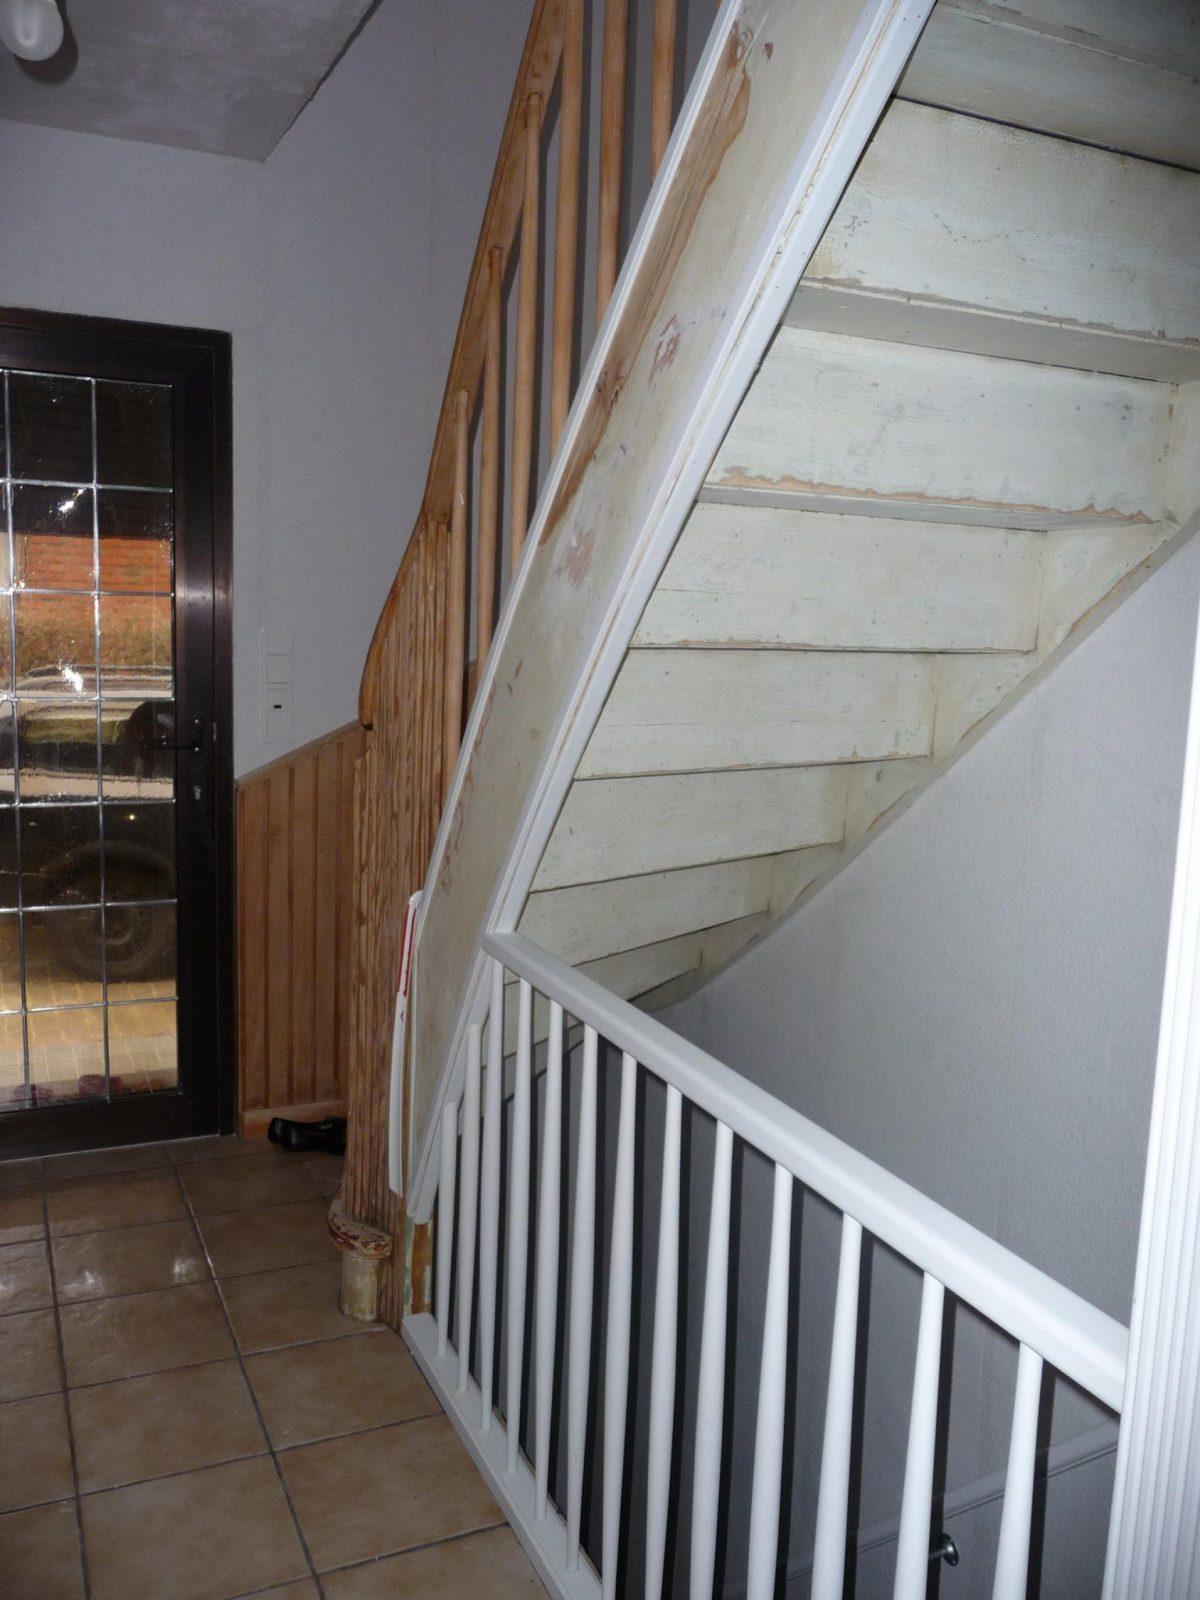 wunderbar holztreppe streichen welche farbe treppe. Black Bedroom Furniture Sets. Home Design Ideas